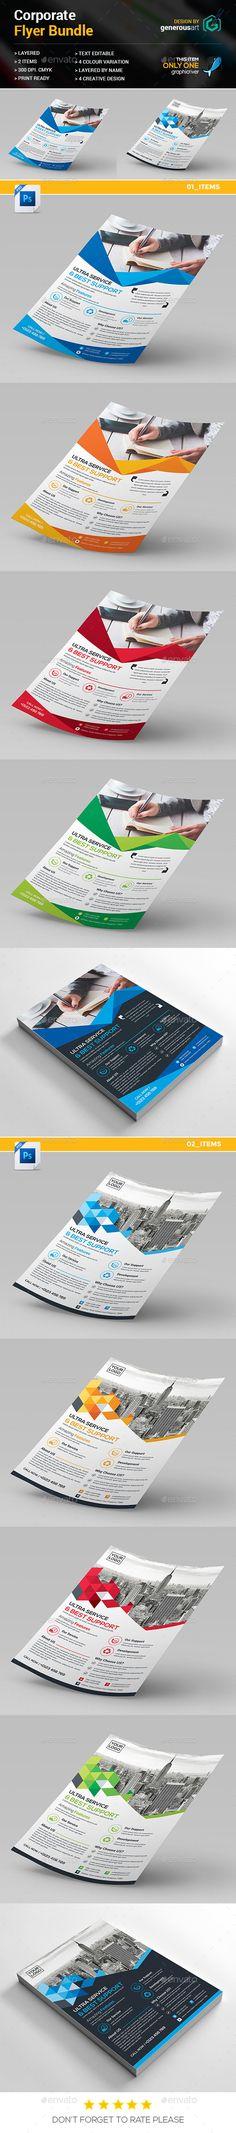 Flyer Templates PSD Bundle. Download here: https://graphicriver.net/item/flyer-bundle-2-in-1/17321515?ref=ksioks